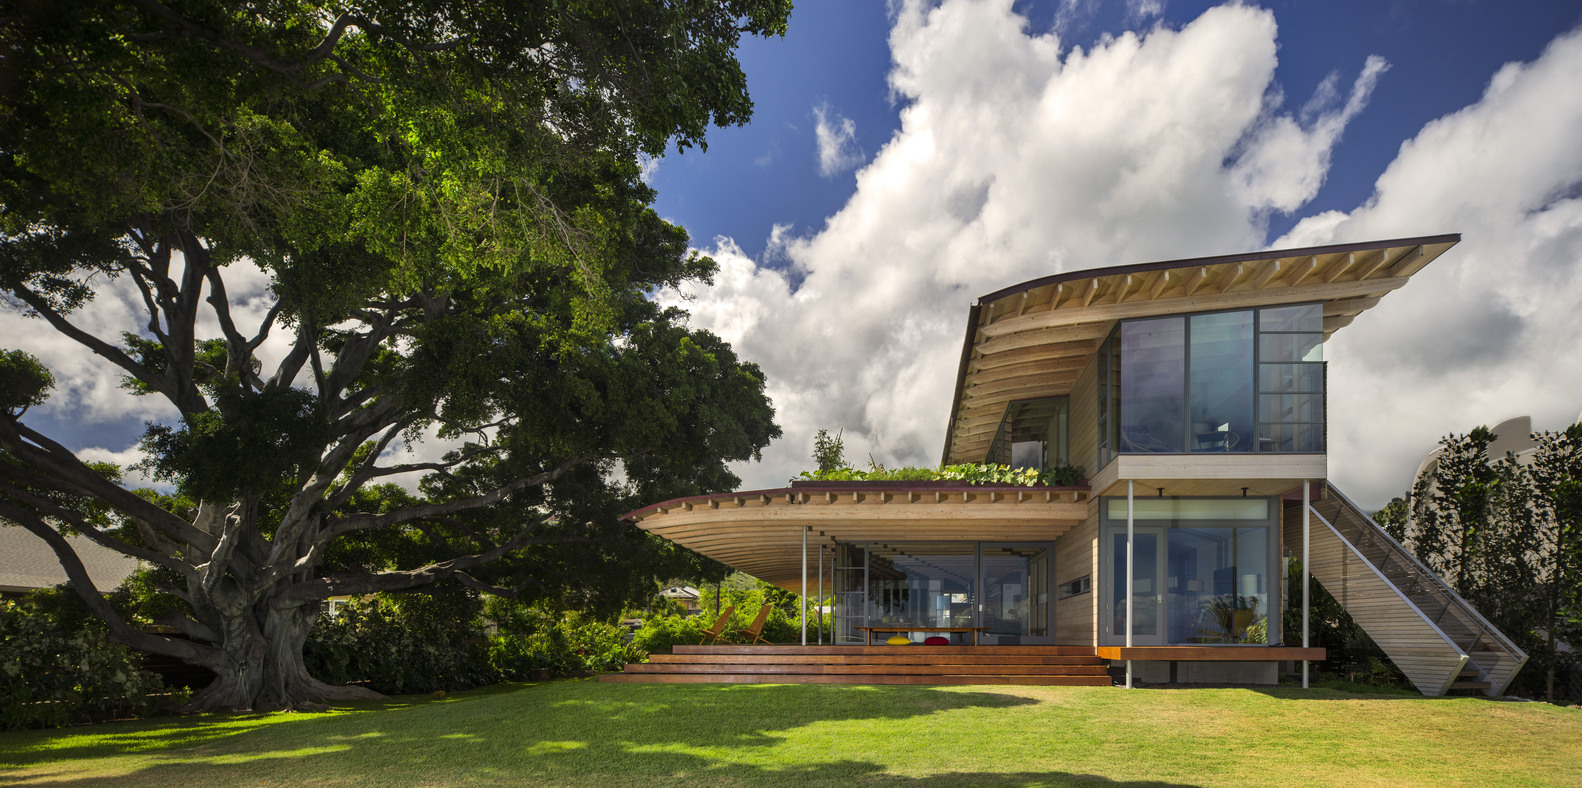 AIA Names 10 Best US Houses Of 2016,Custom Housing: Island Residence;  Honolulu